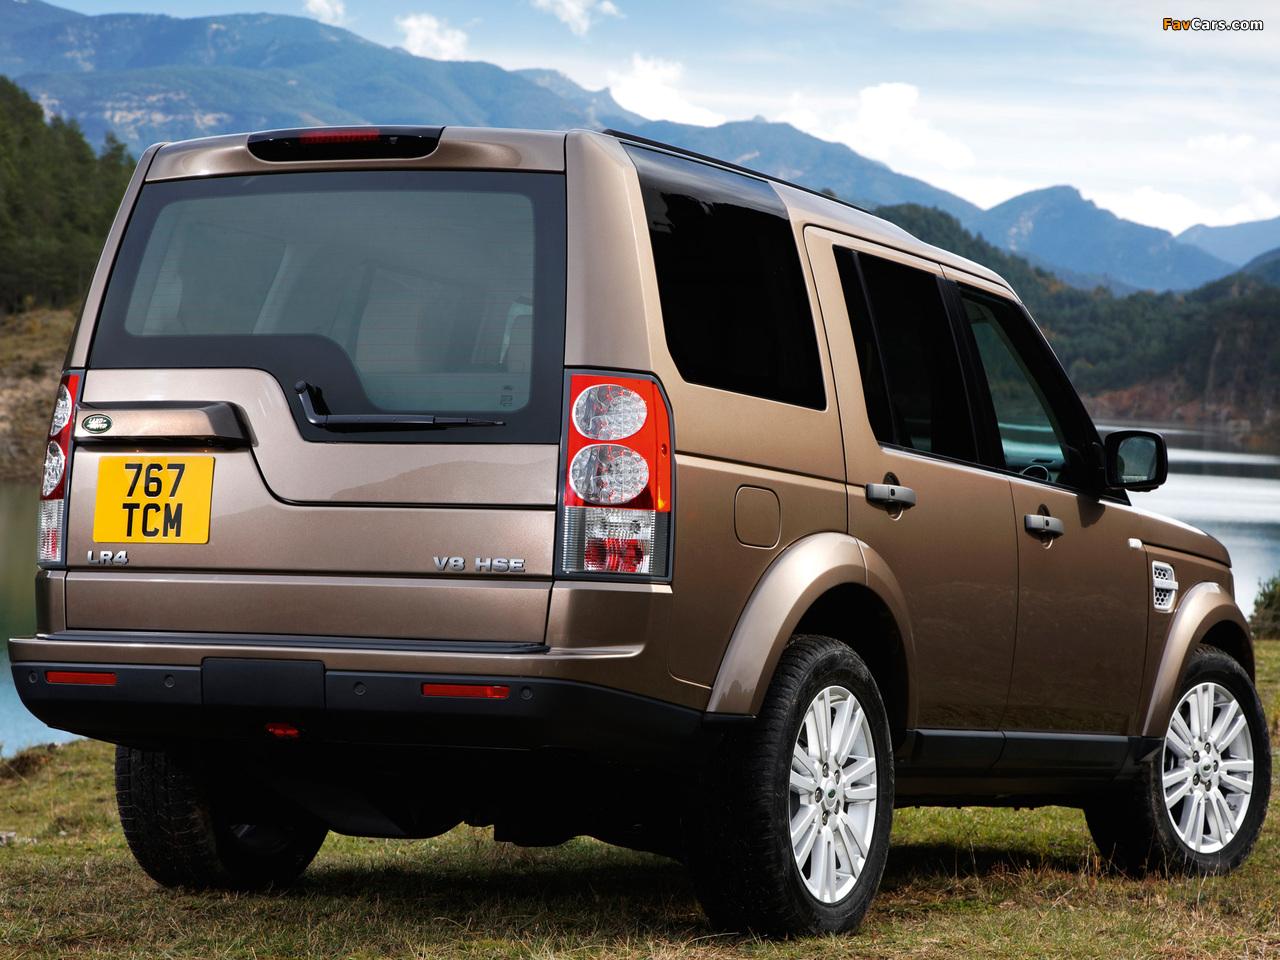 Land Rover LR4 2009 images (1280 x 960)